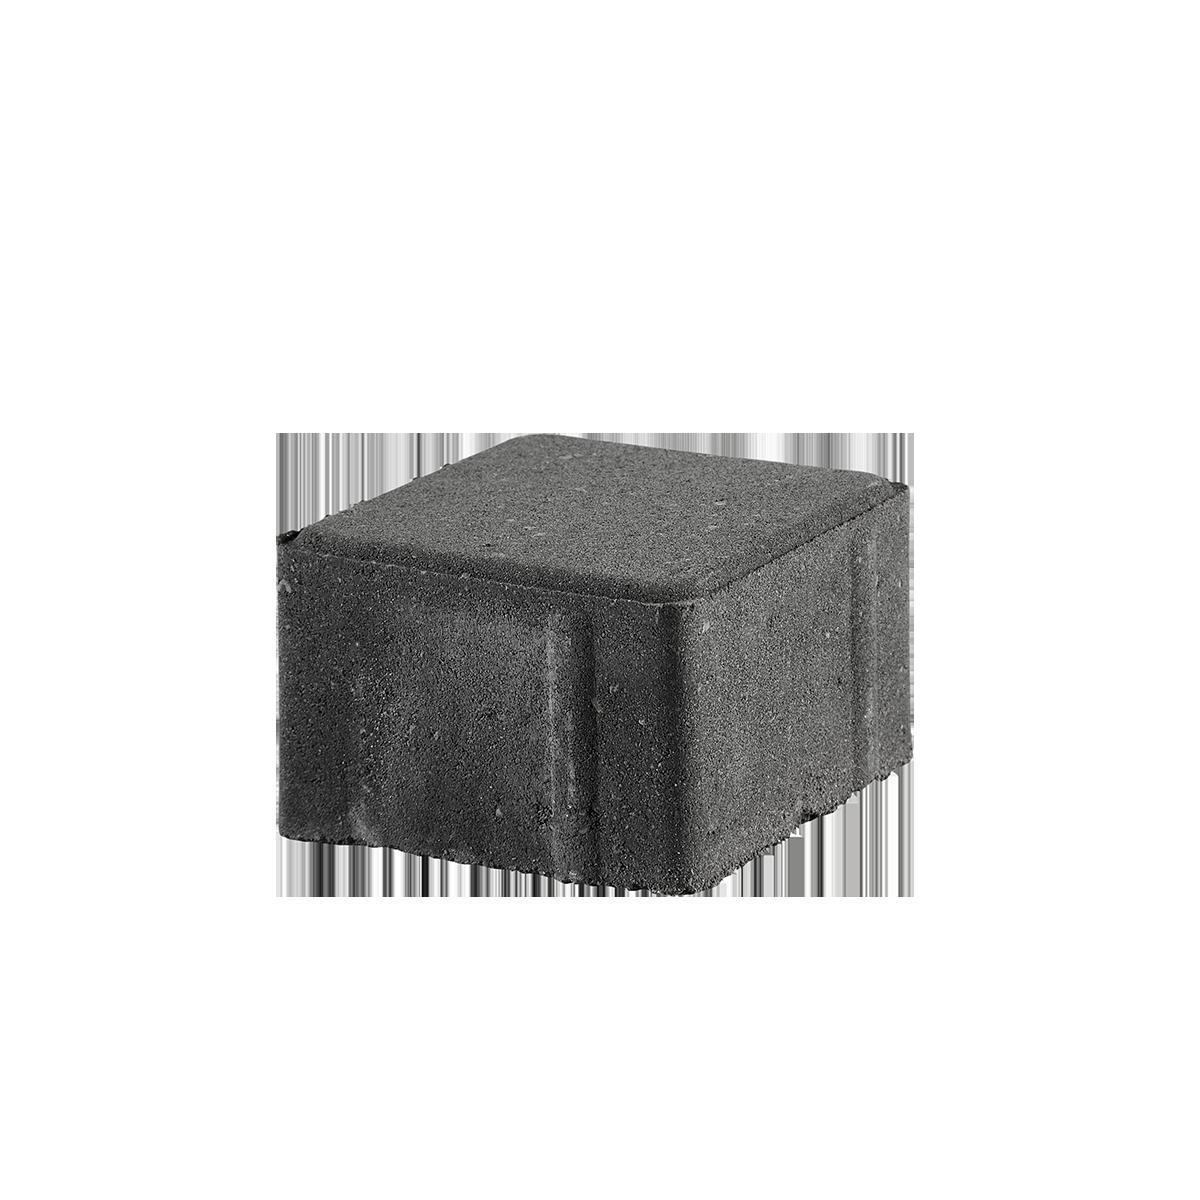 Betonbrosten 10x10x8 cm Sort/Antracit